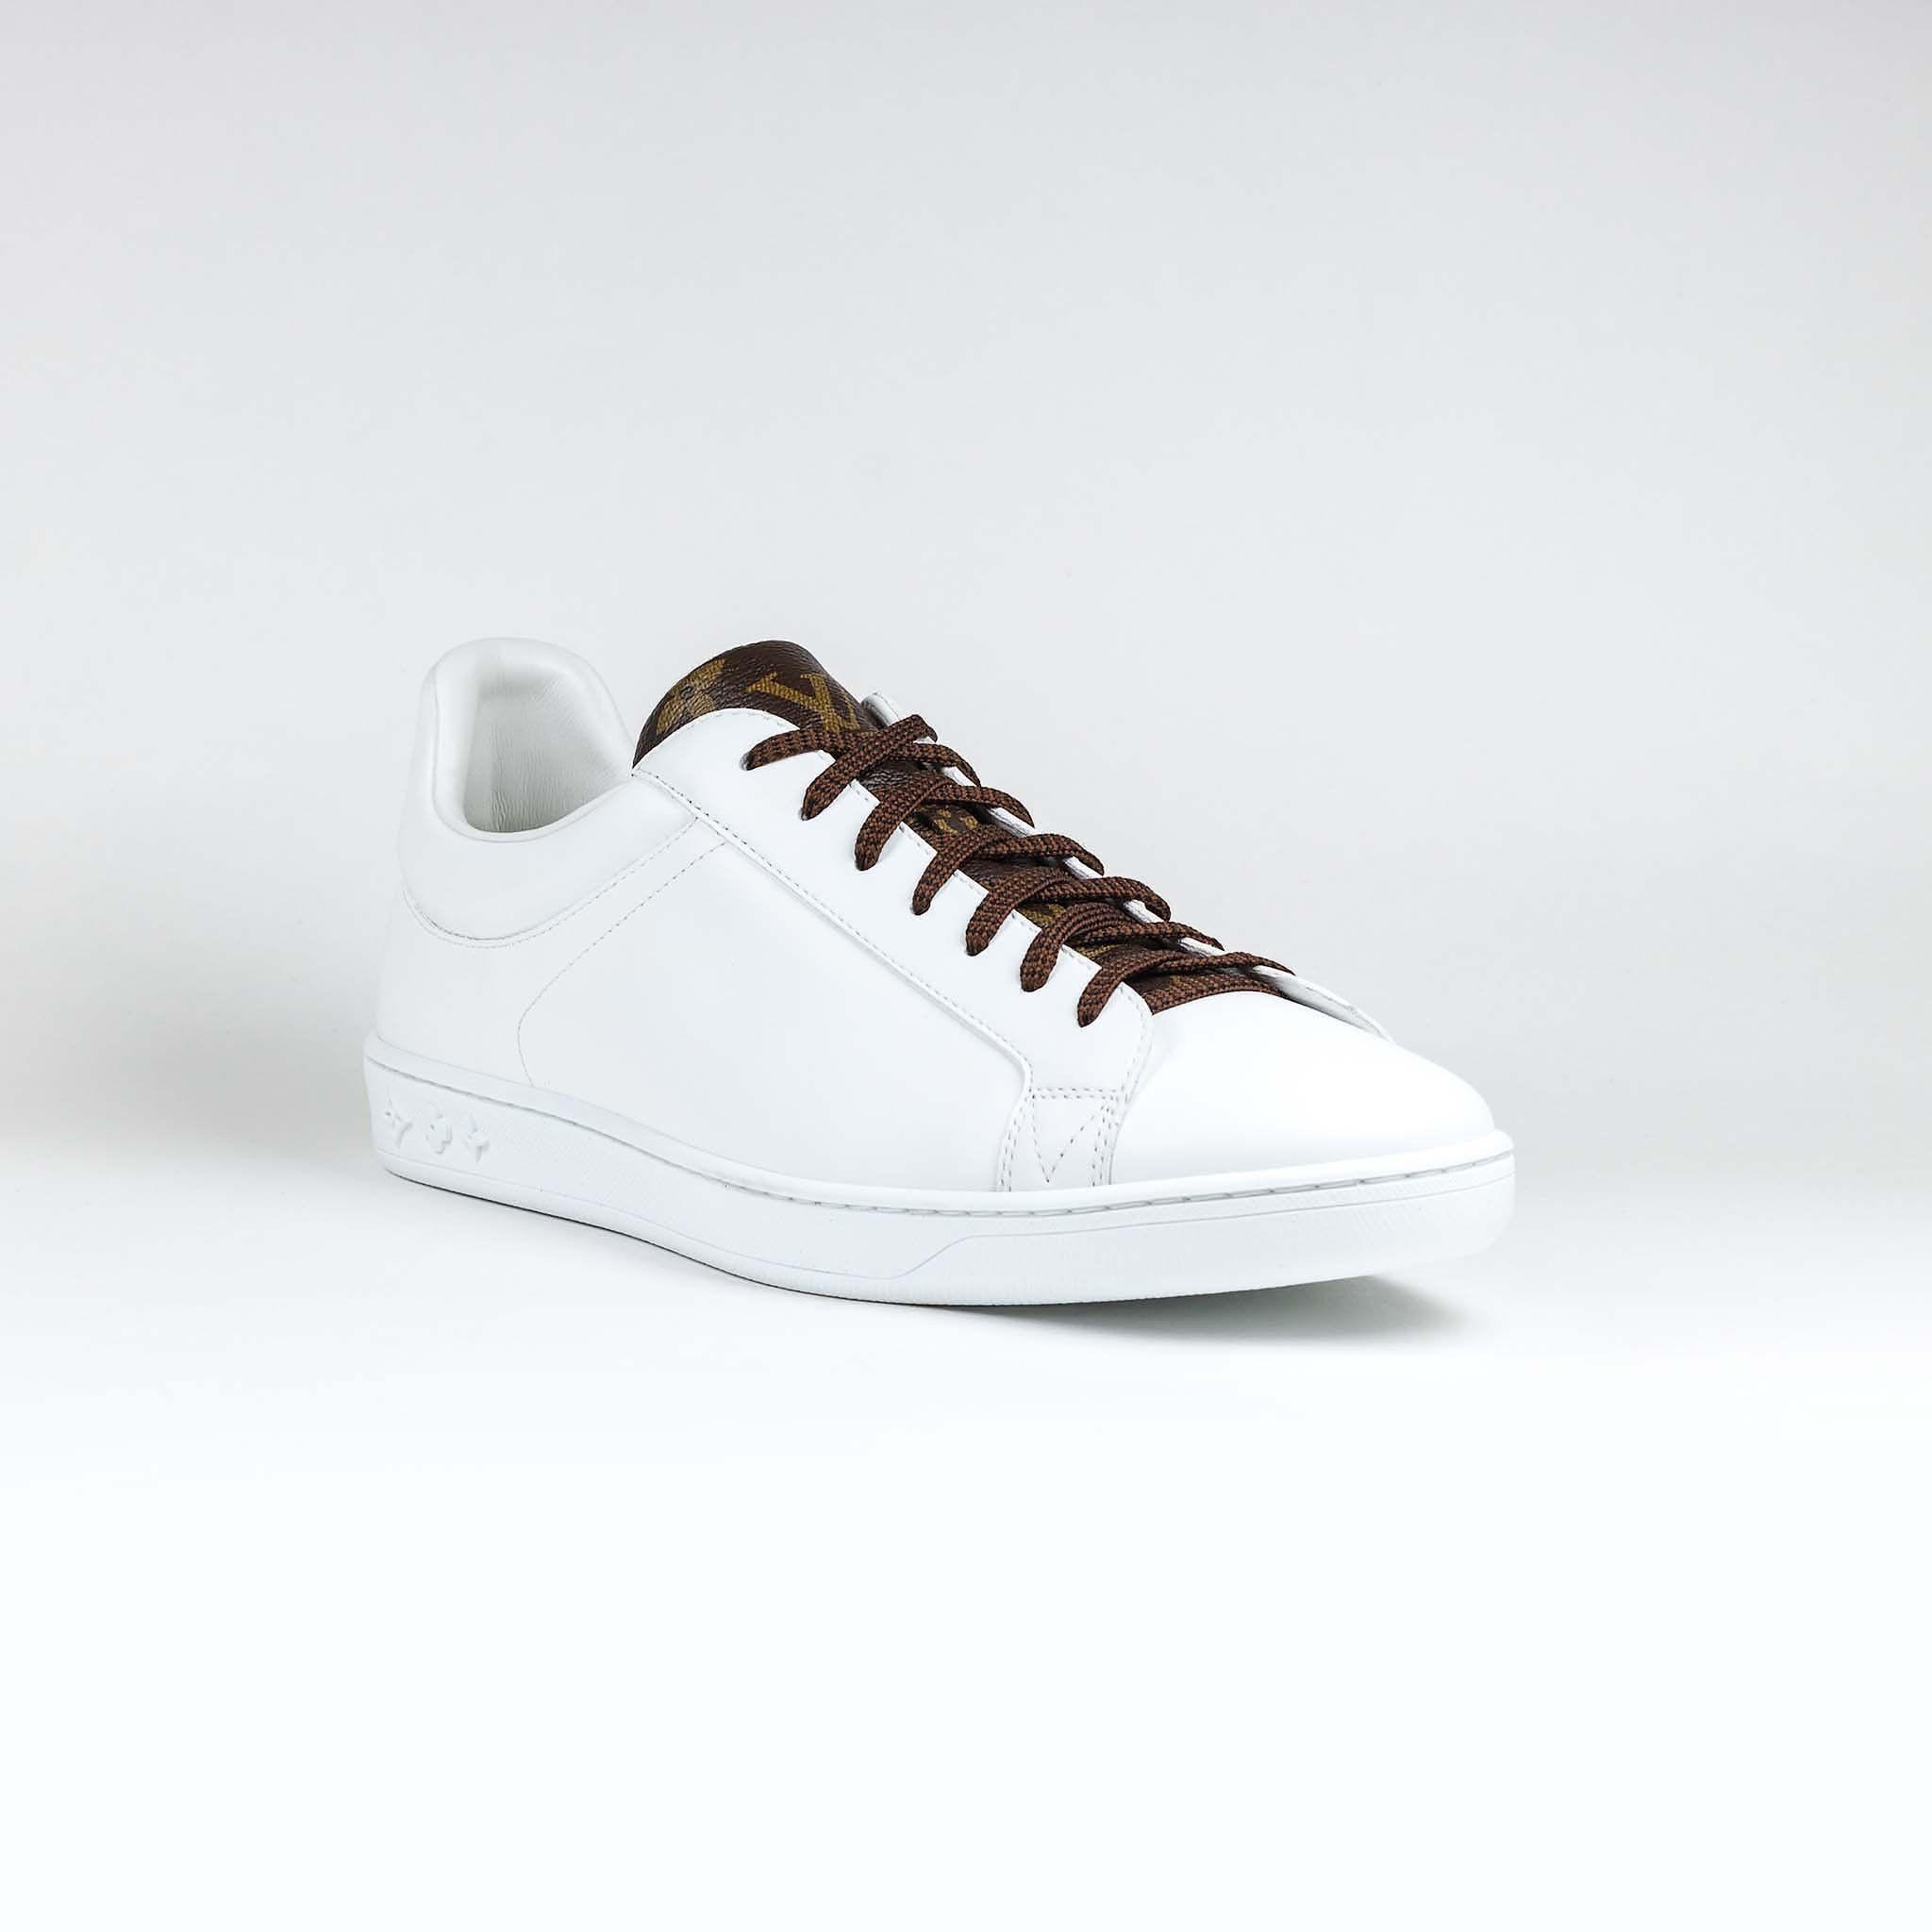 89f3cf7867c13 Louis Vuitton Luxembourg Monogram Brown White Sneaker